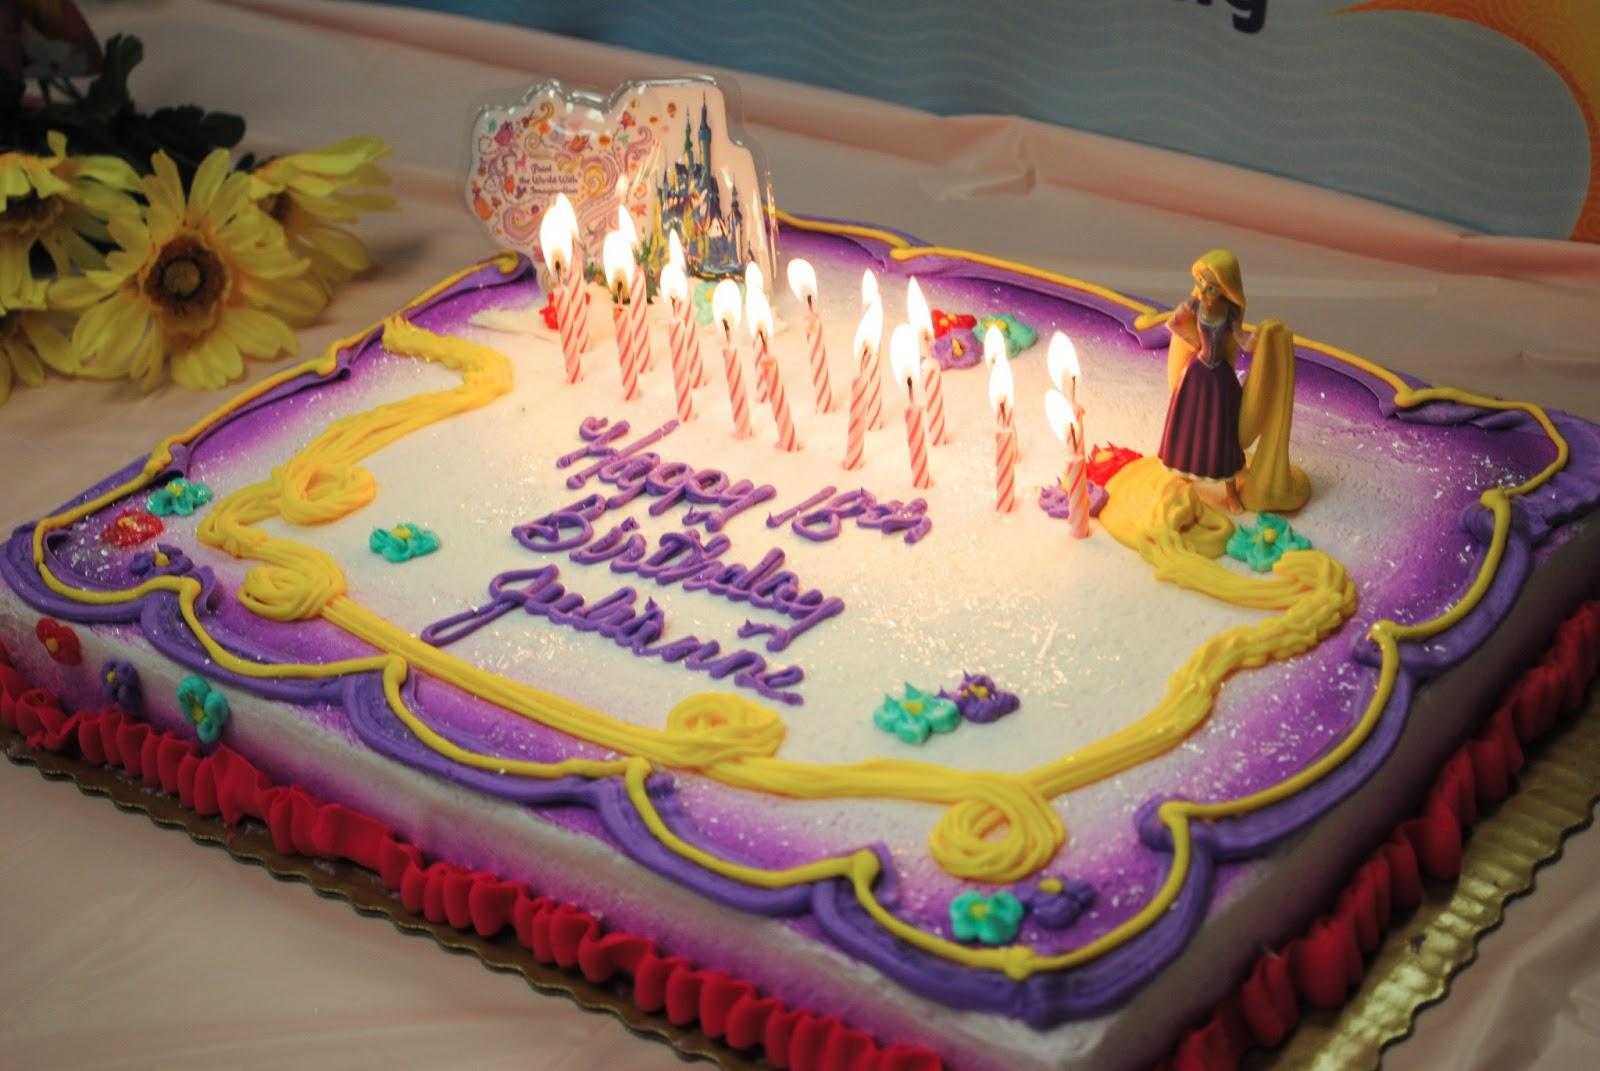 Fantastic 8 Kroger Birthday Cakes Photo Kroger Birthday Cake Designs Funny Birthday Cards Online Fluifree Goldxyz